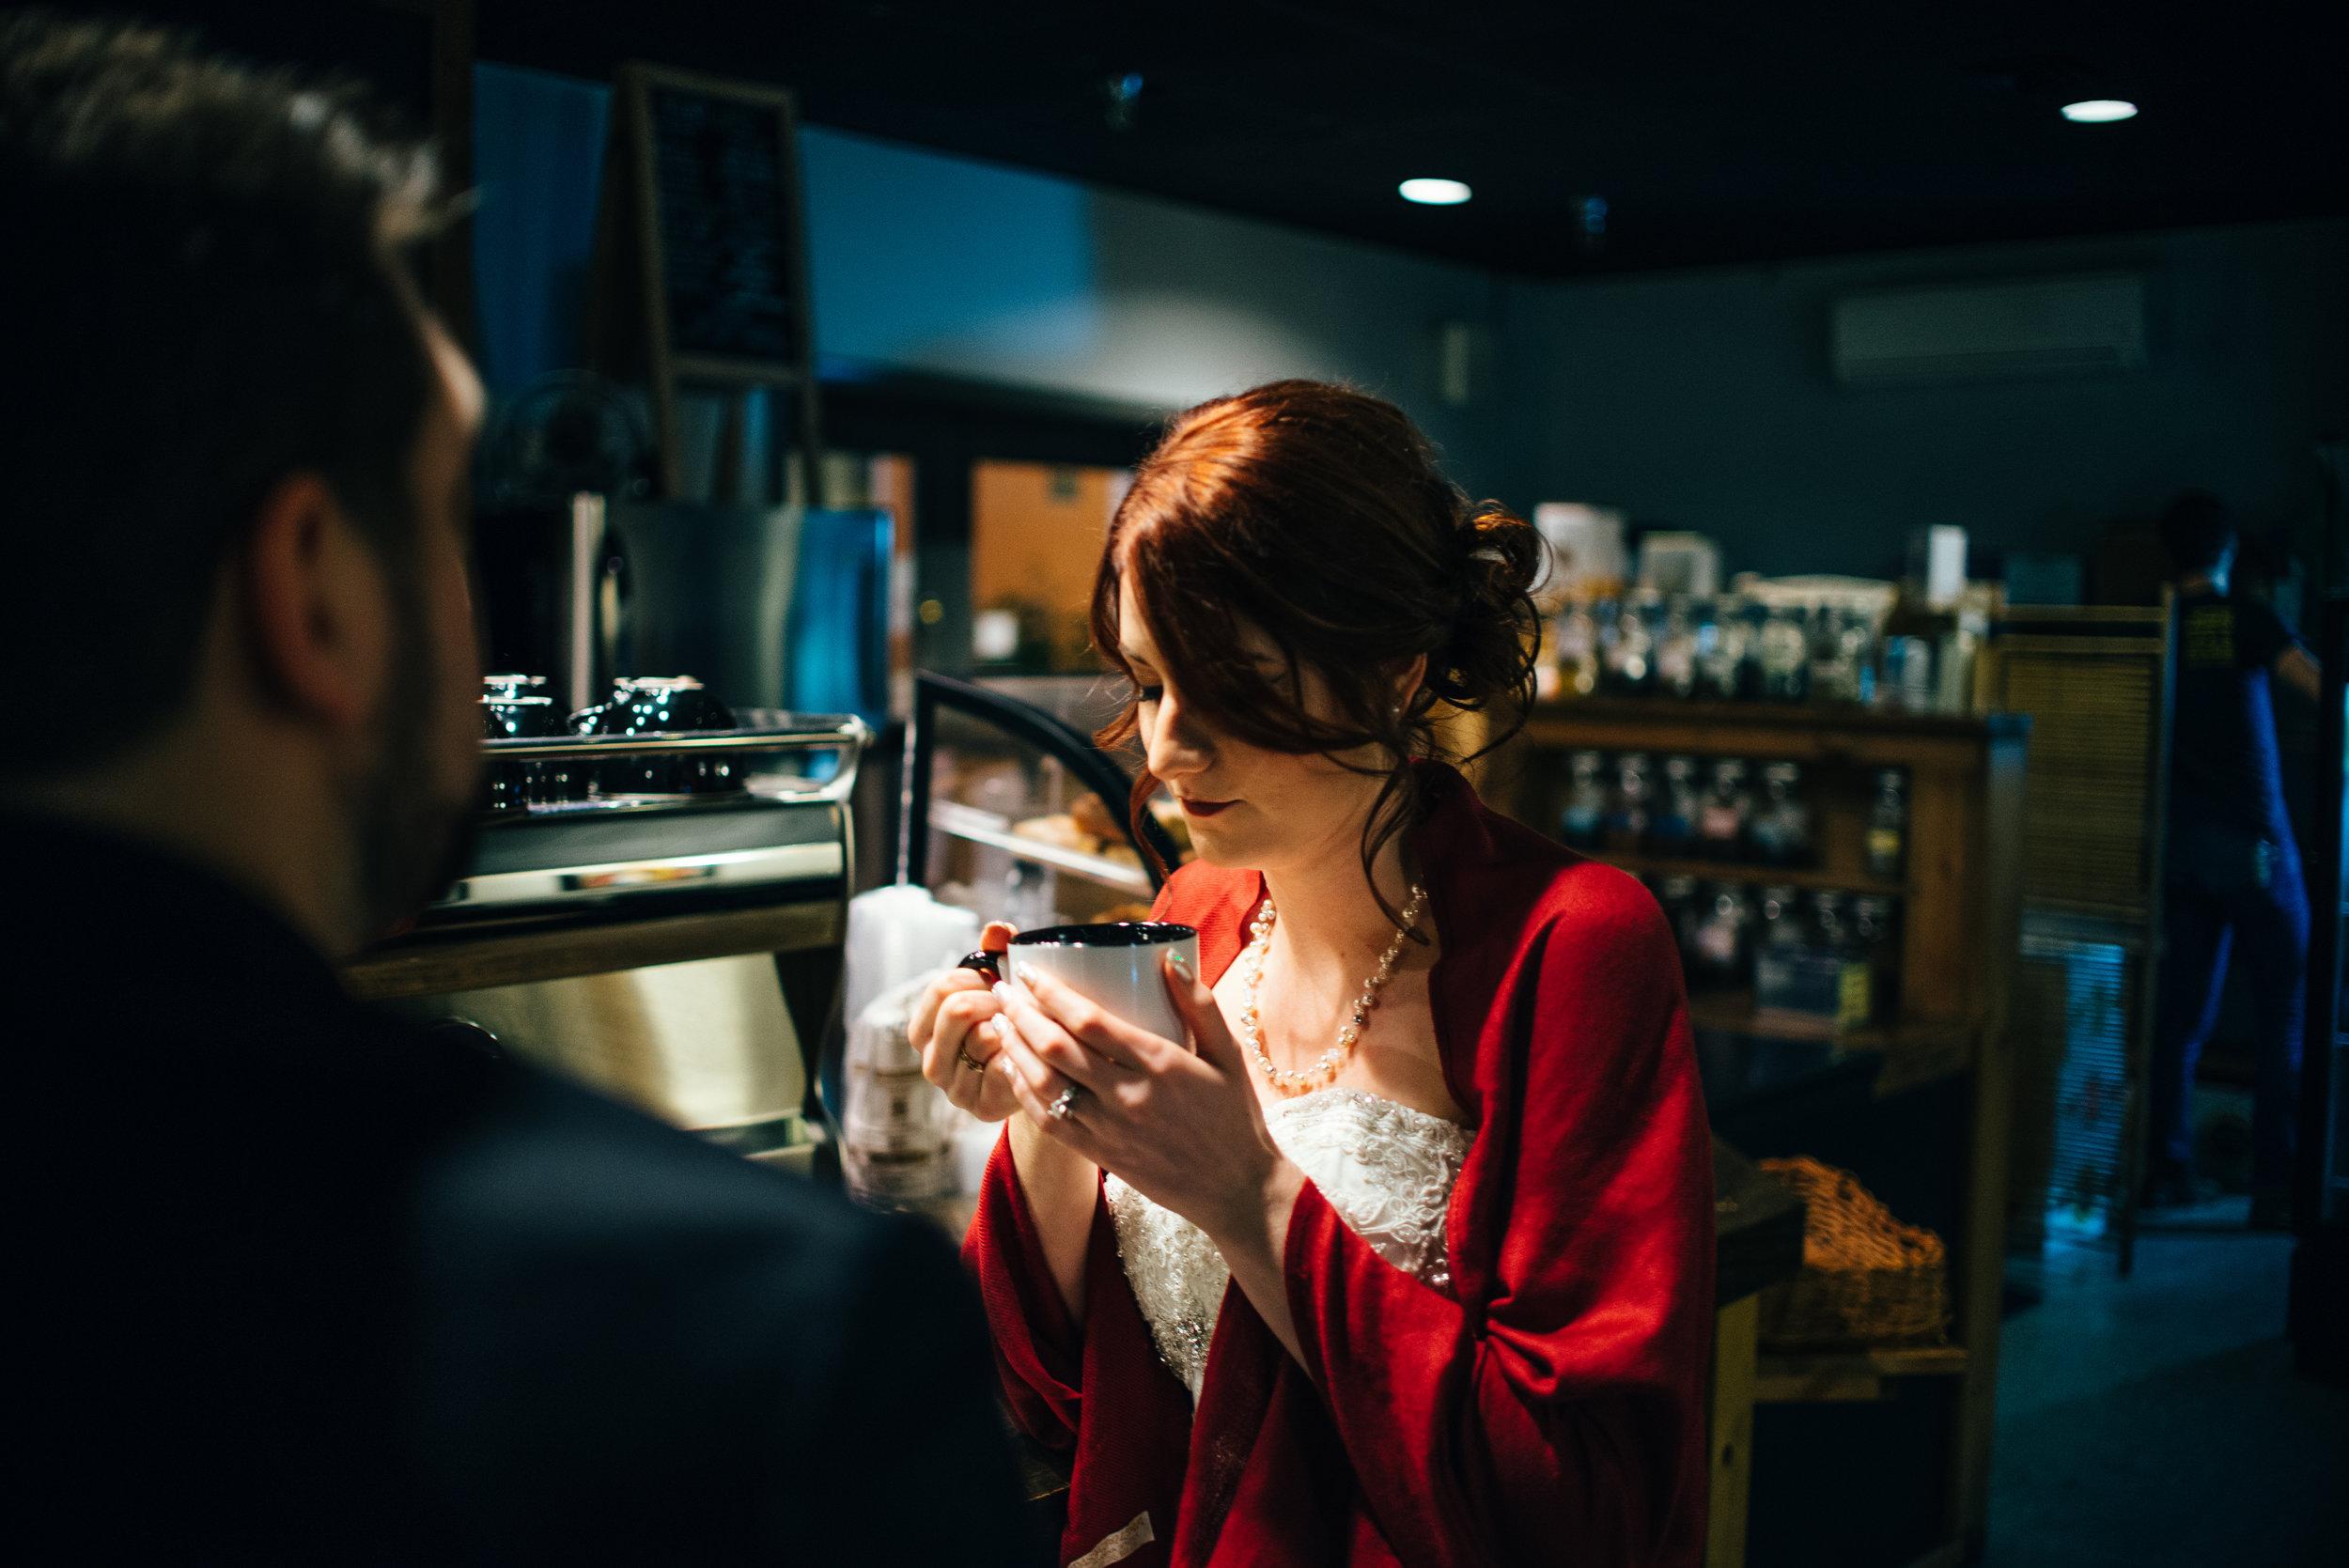 @Jill Gearhart Photography (www.jillgearhartphotography.com)